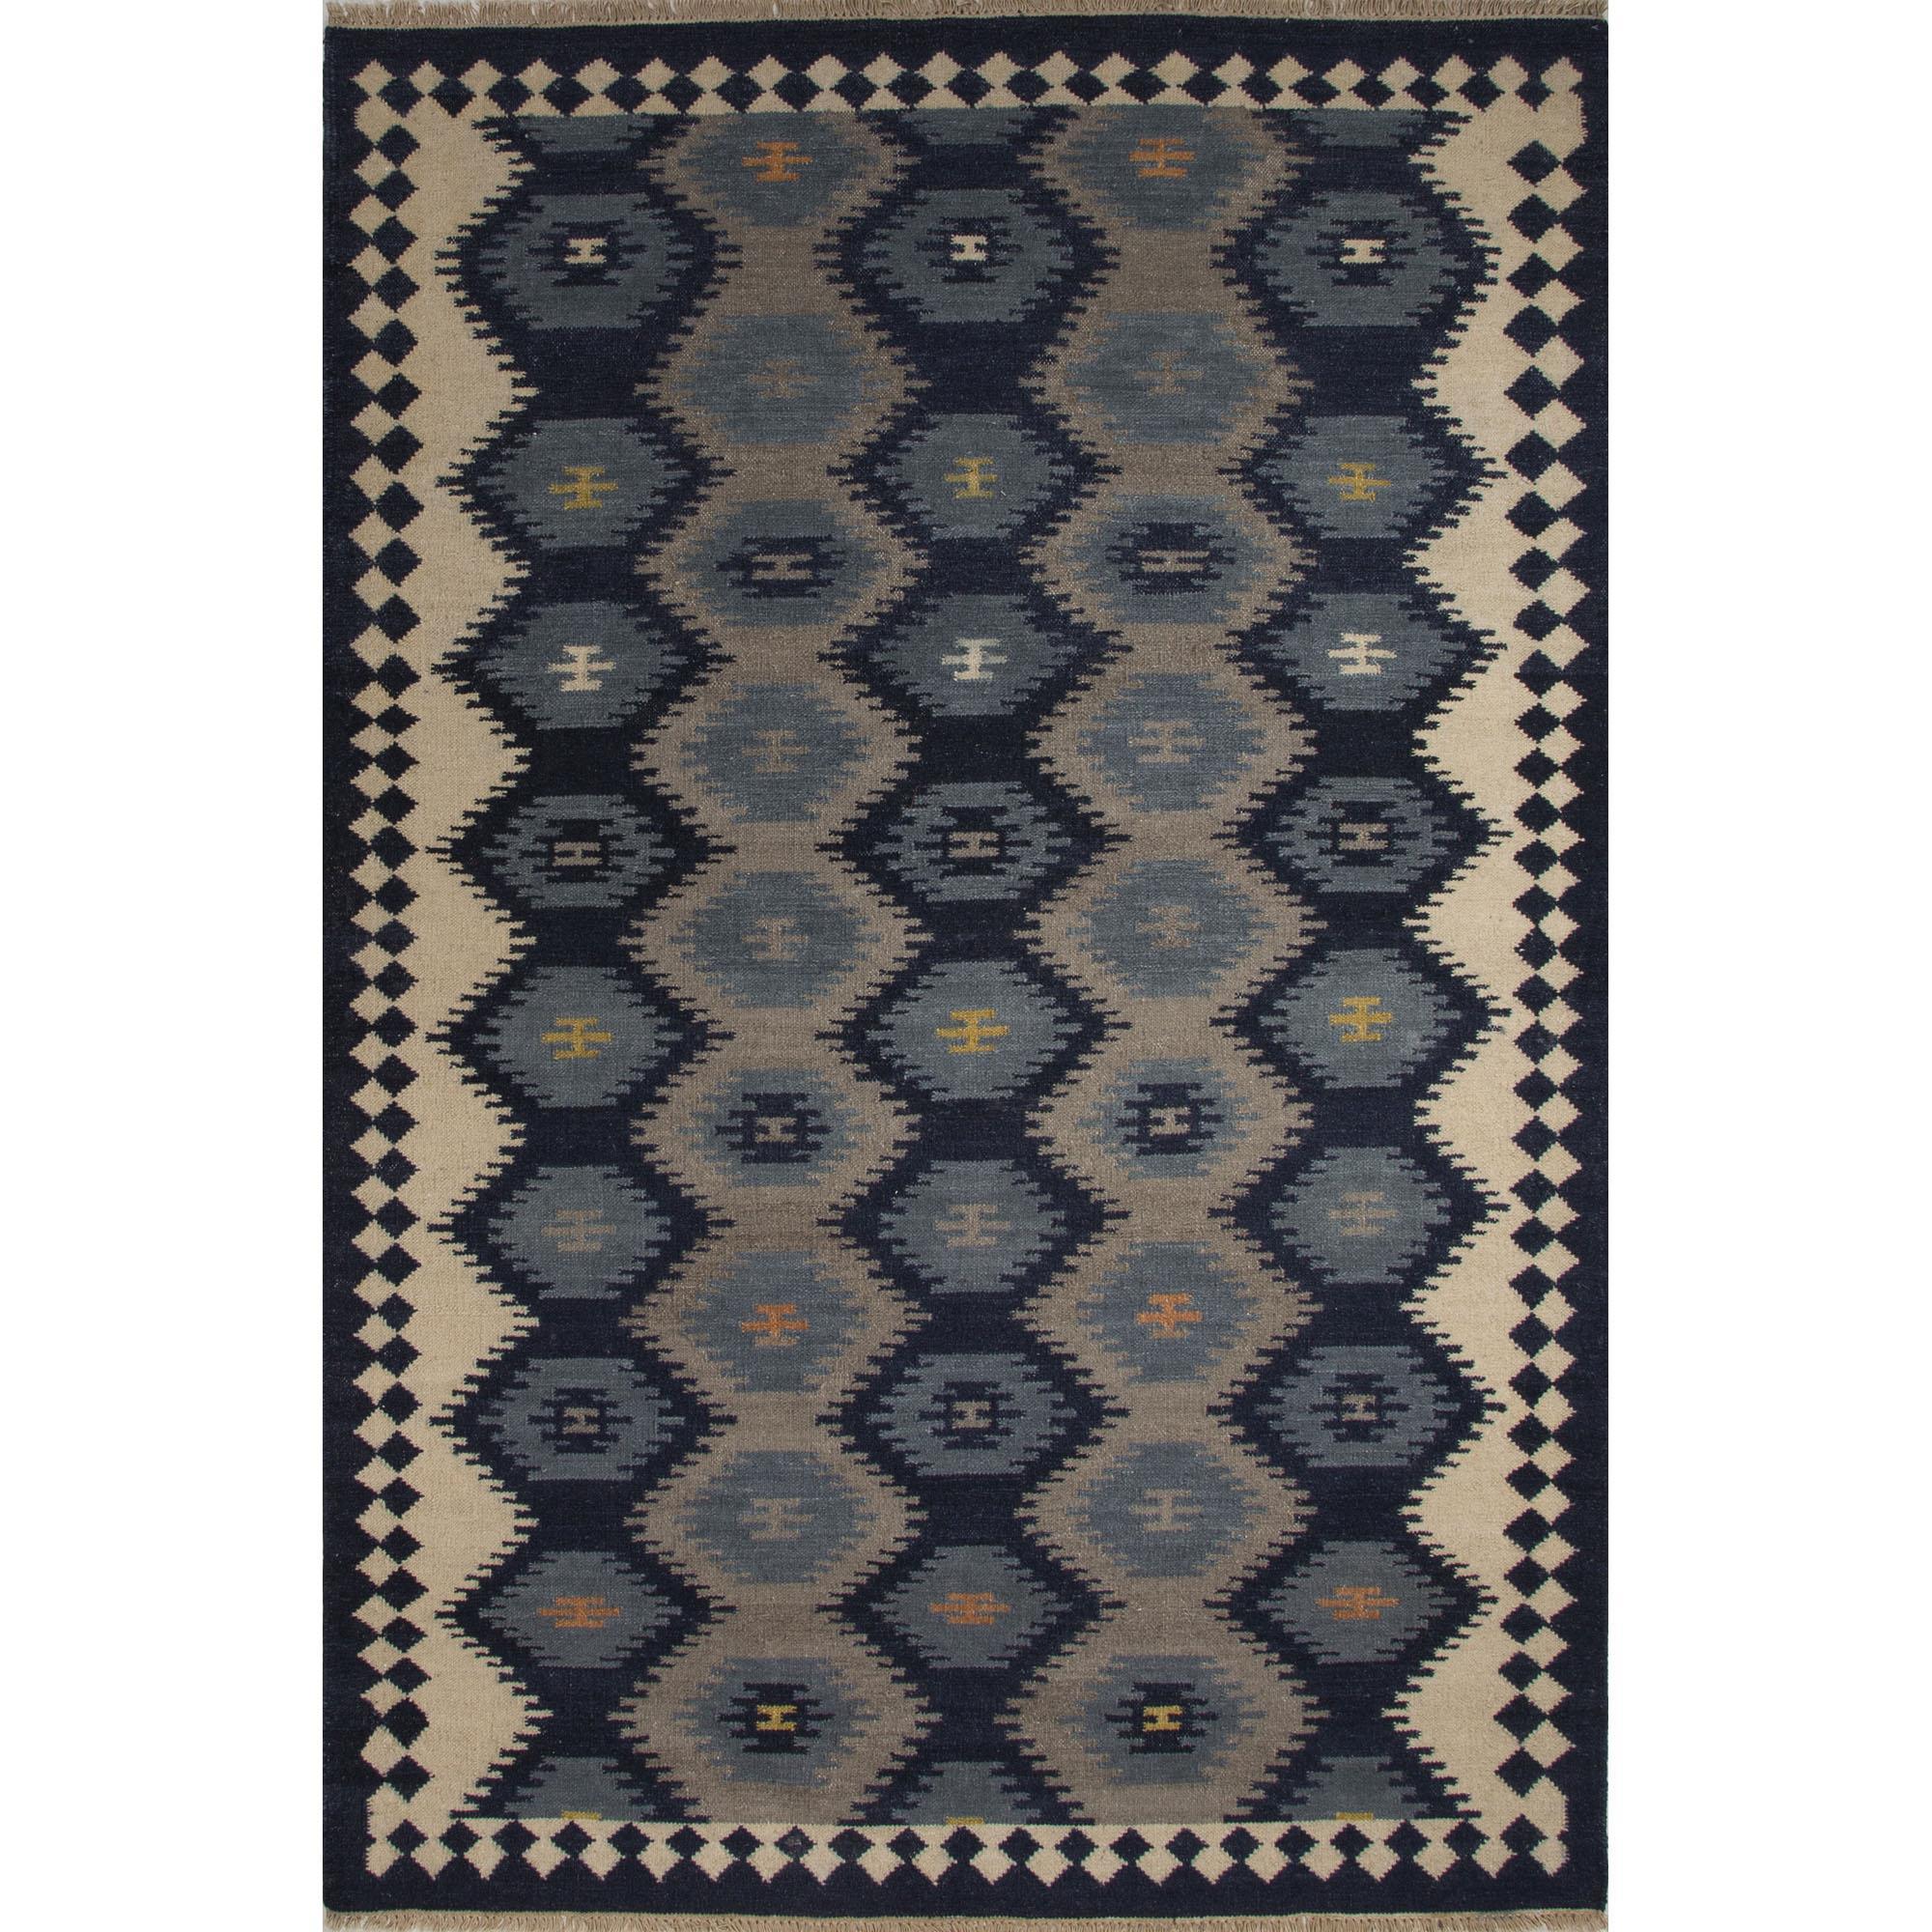 Anatolia 4 x 6 Rug by JAIPUR Living at Sprintz Furniture